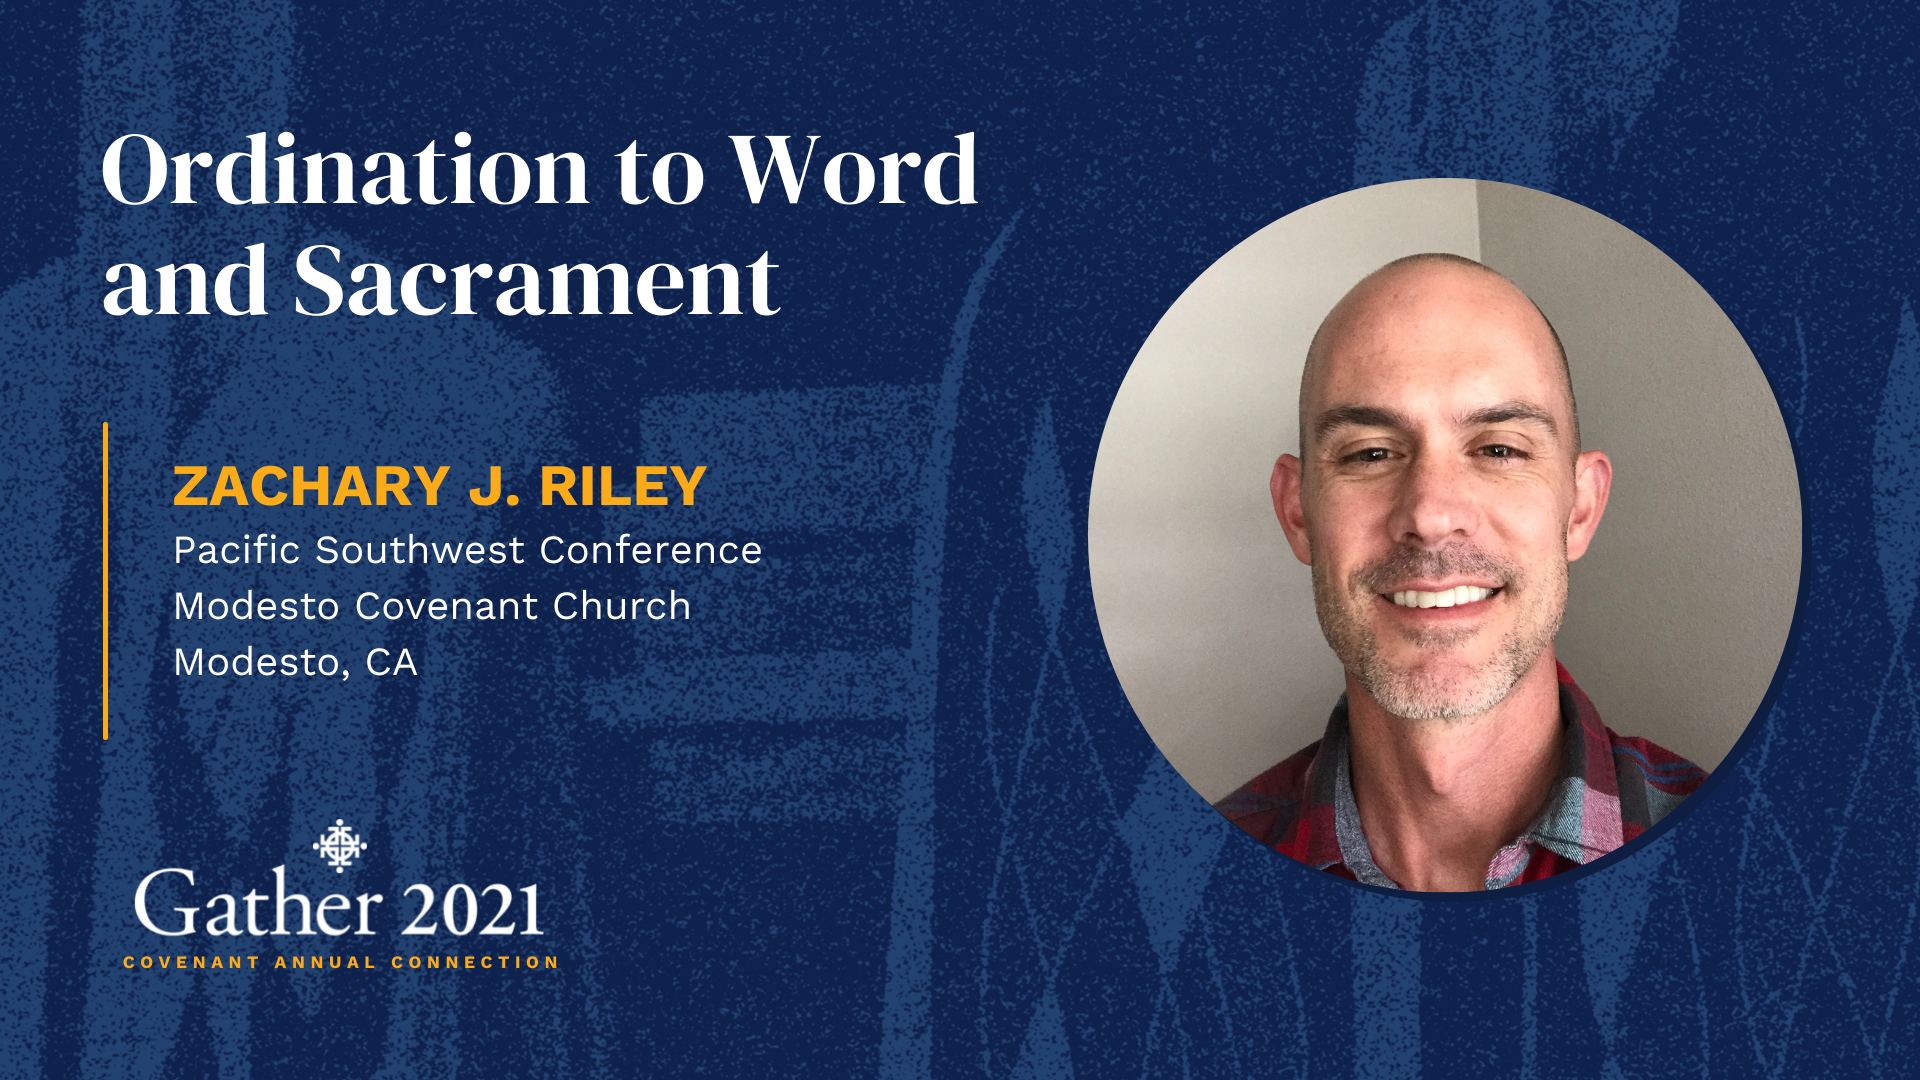 Zachary J. Riley